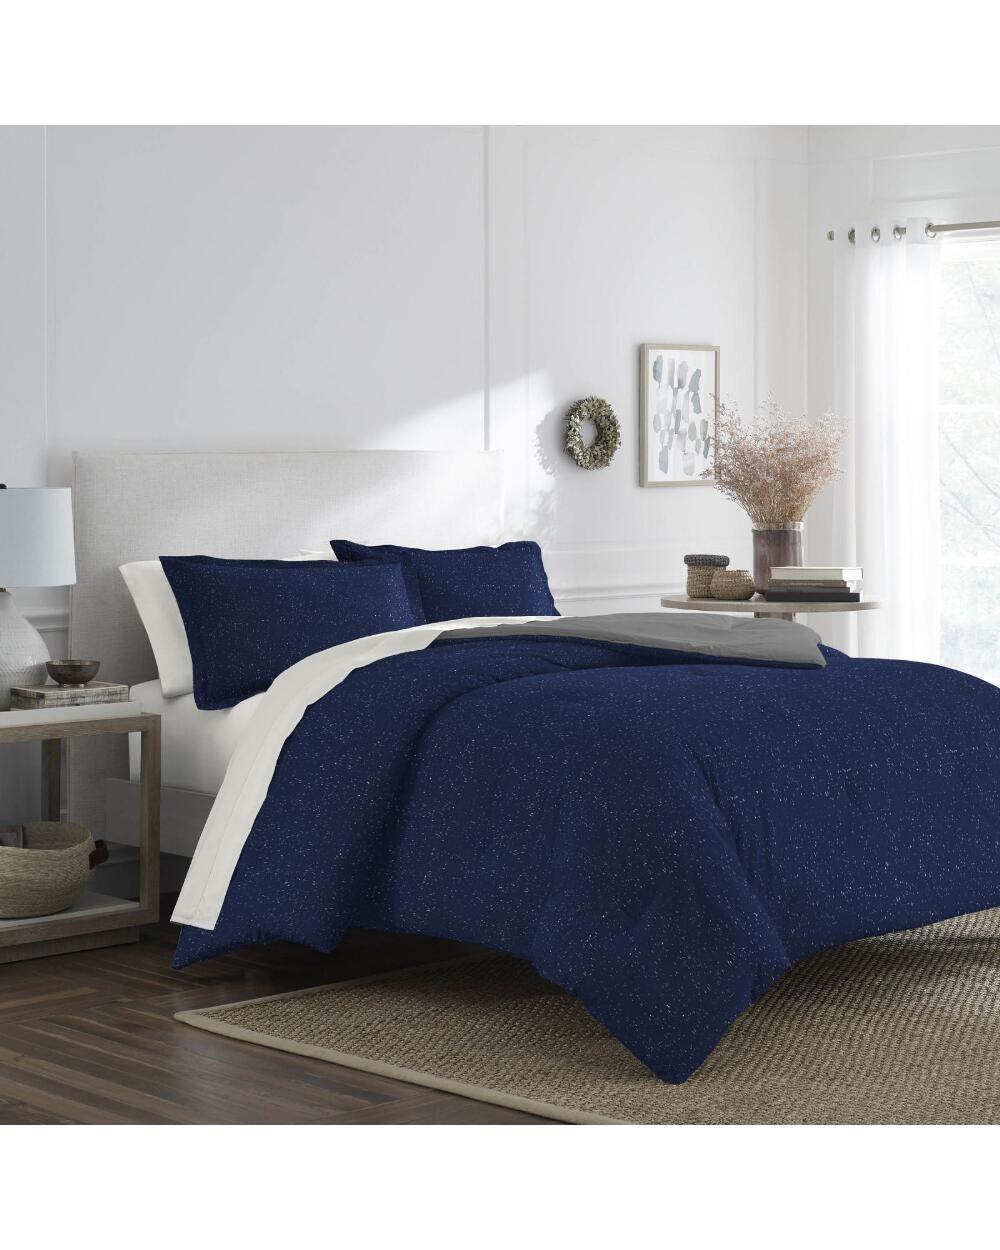 Martex 3 Piece Mason Marled Jersey Comforter Set King